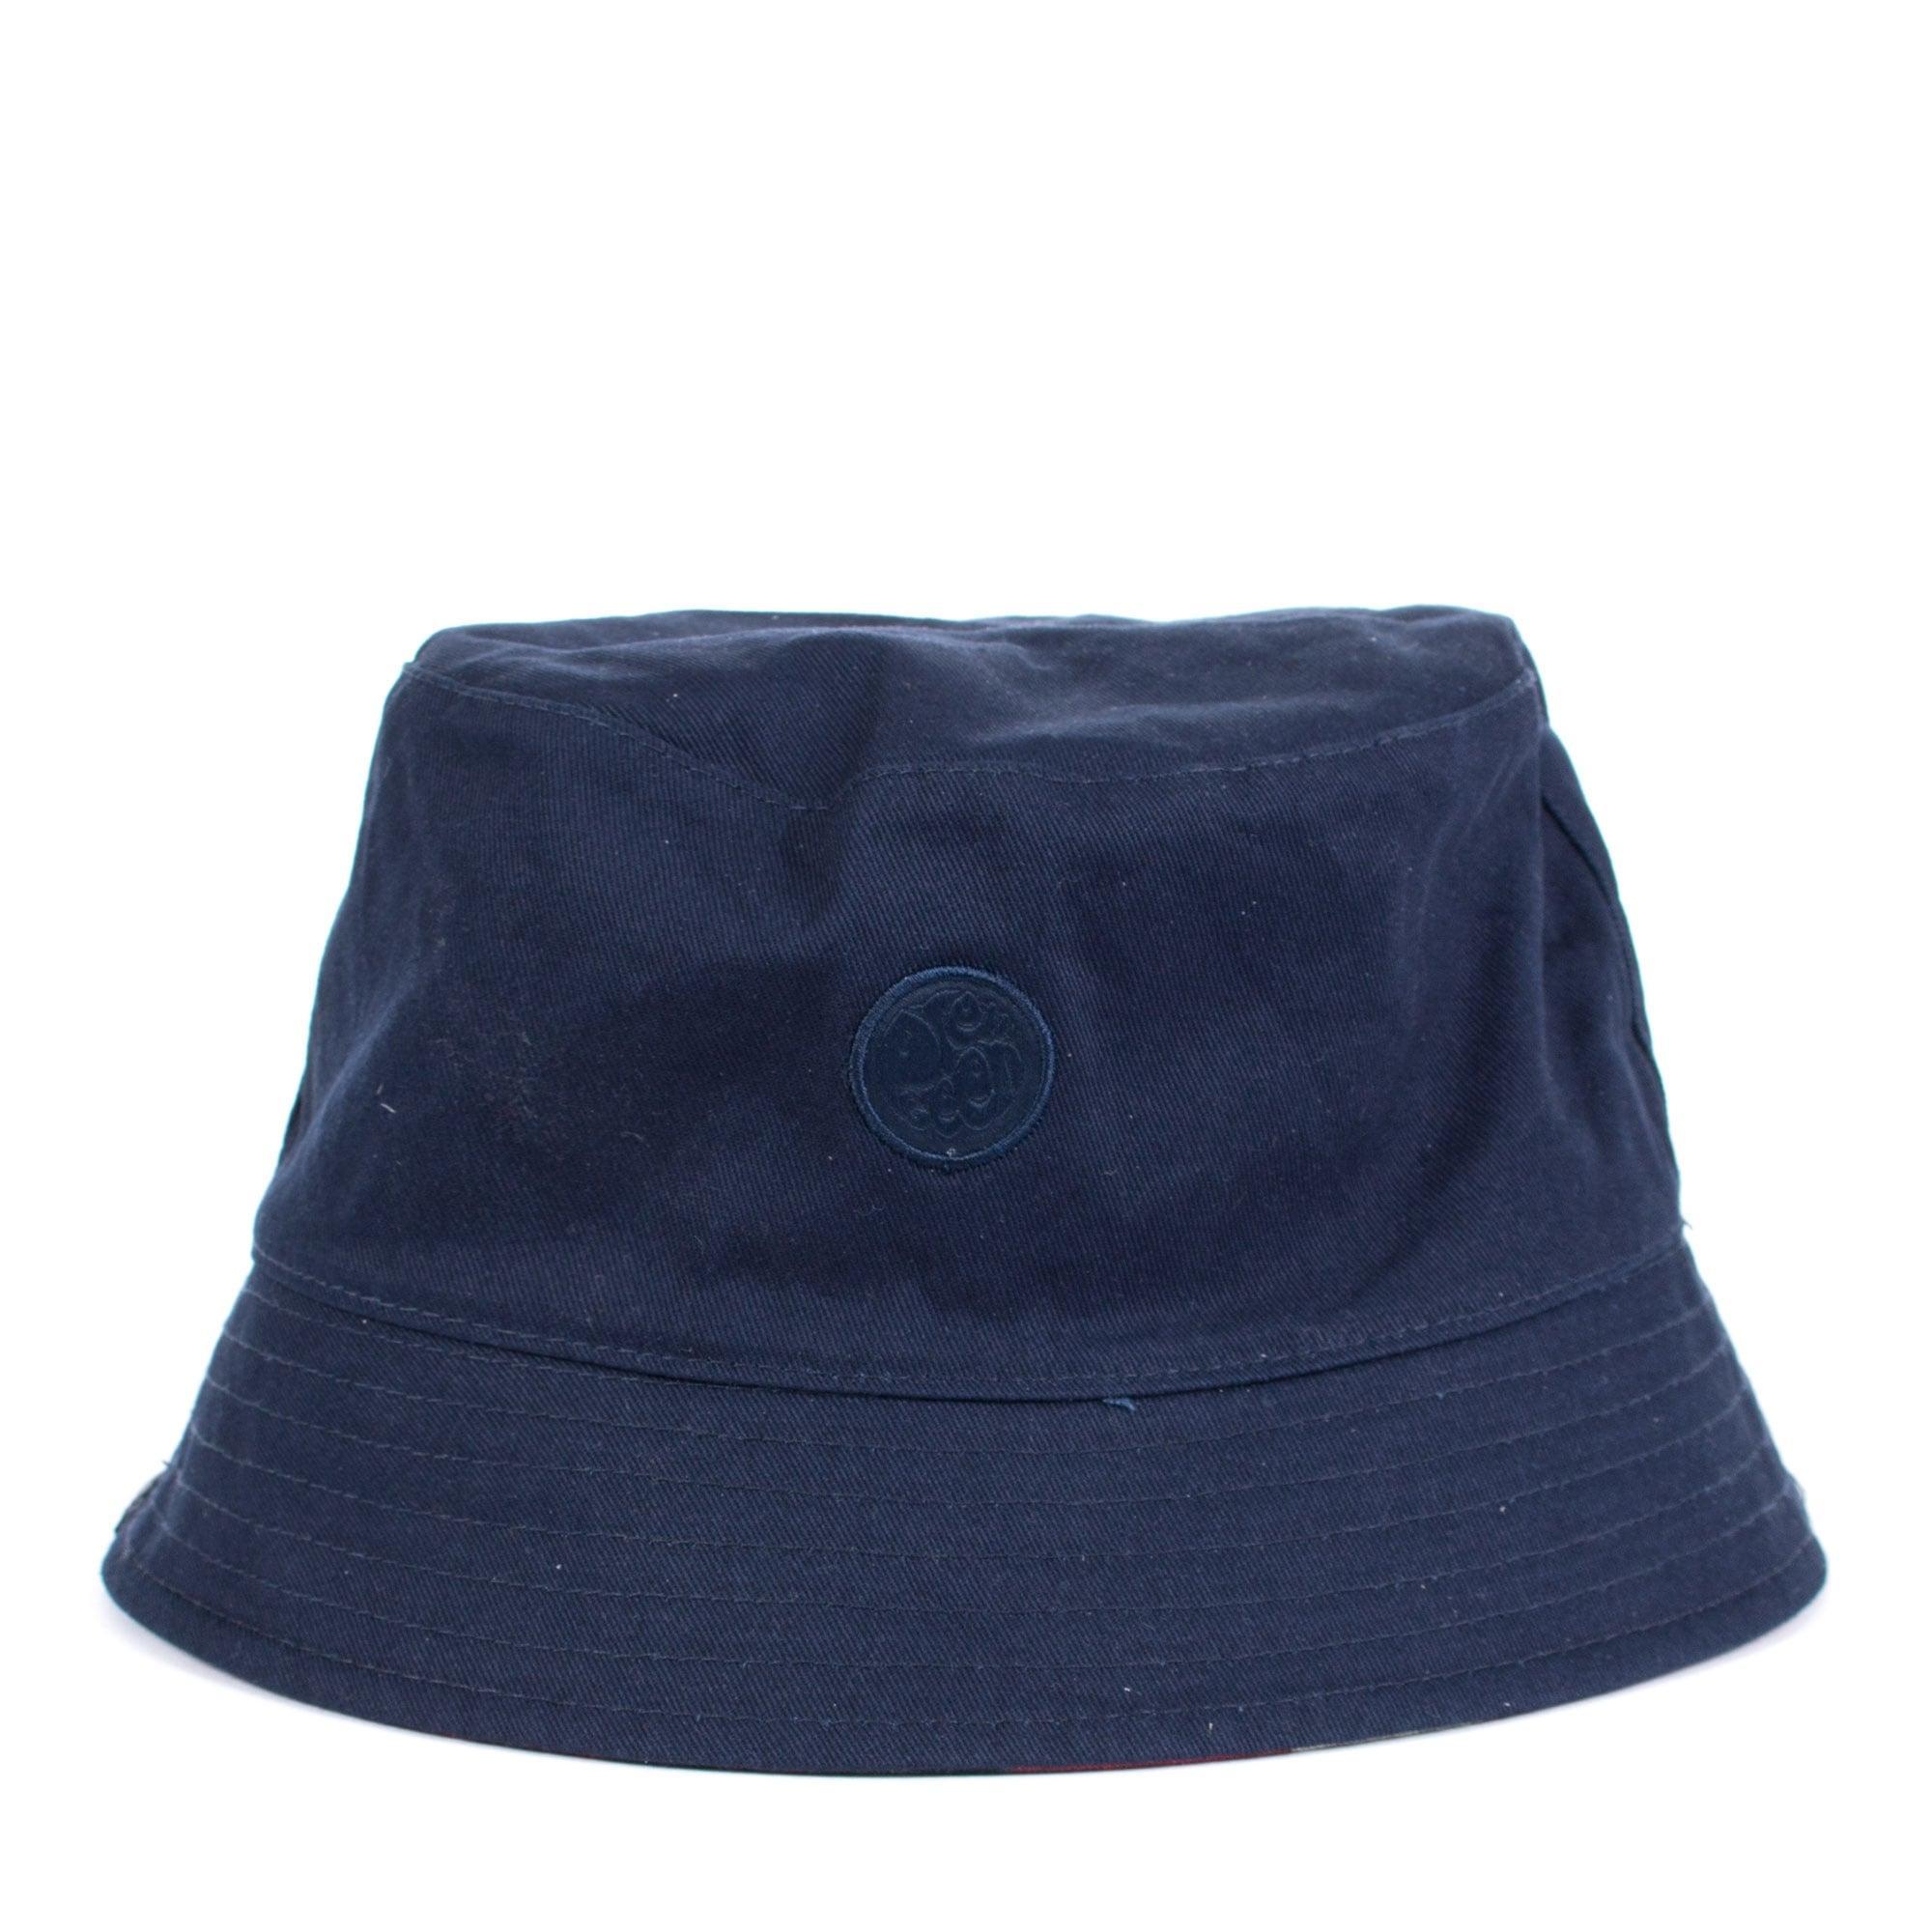 7ae55b3e515 Pretty Green - Blue Reversible Union Jack Bucket Hat for Men - Lyst. View  fullscreen